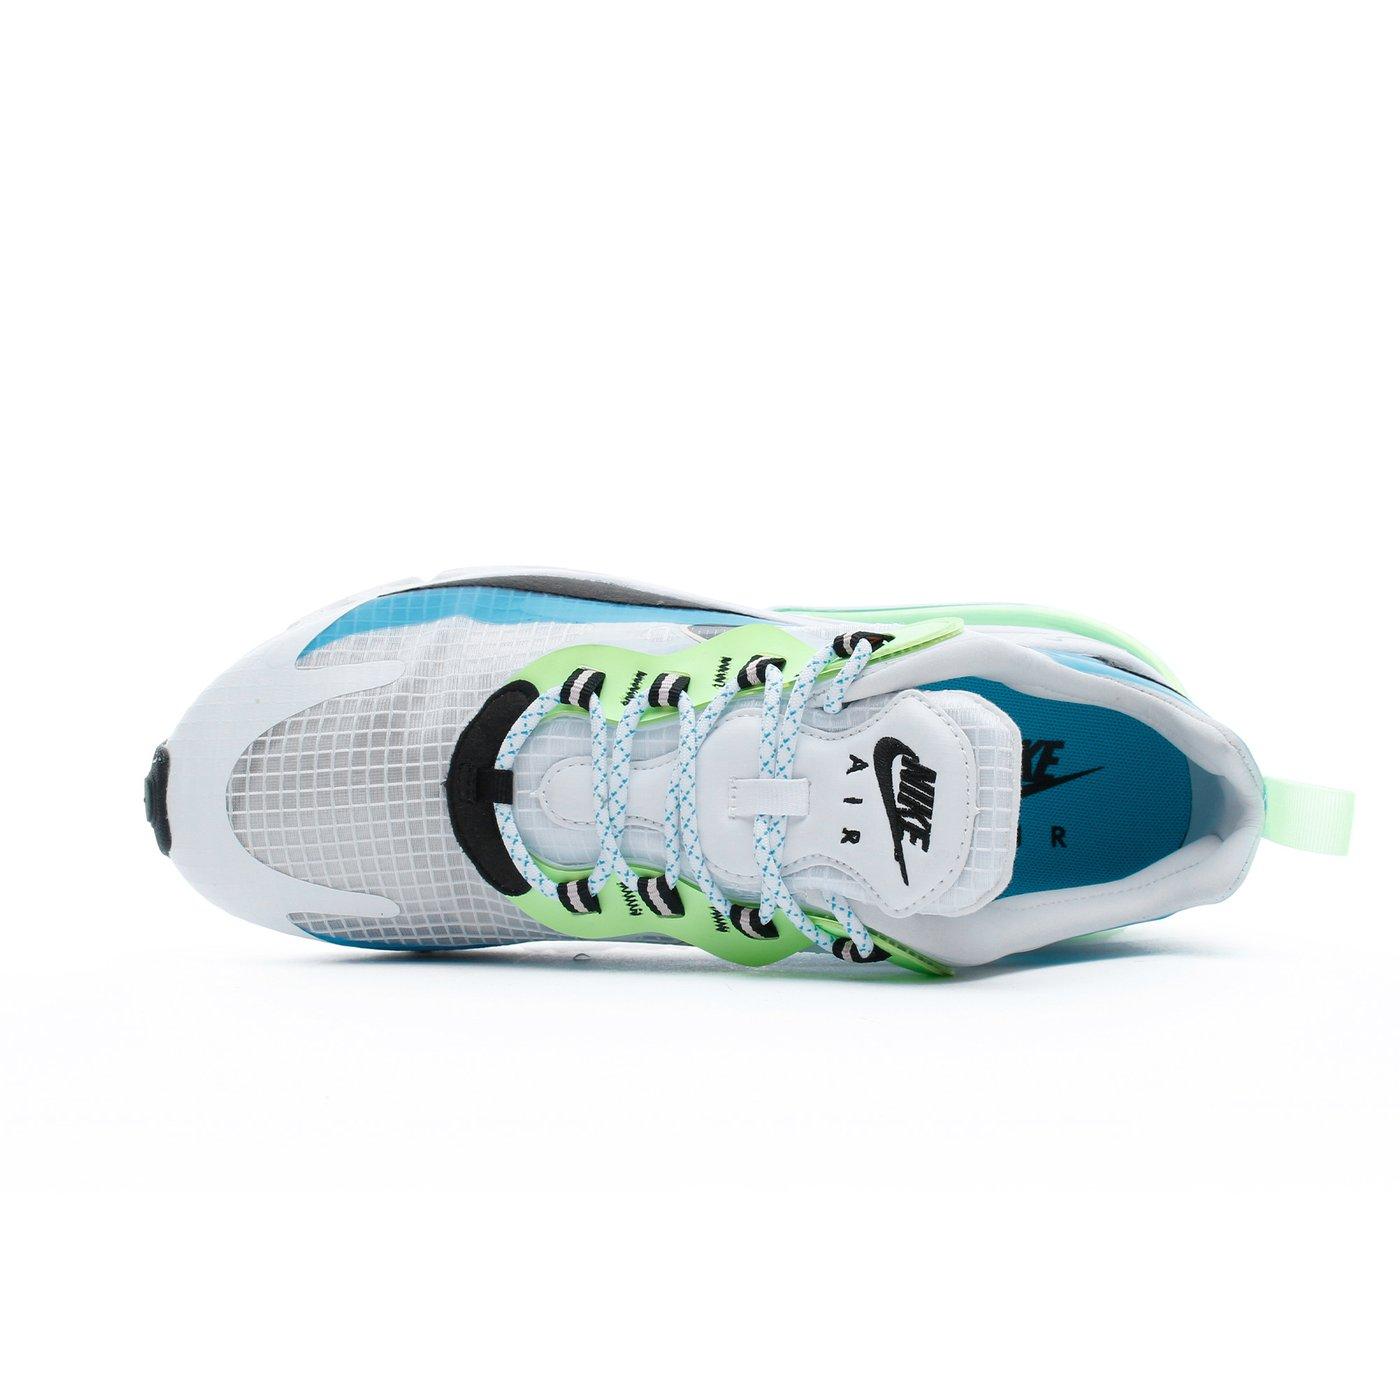 Nike Air Max 270 React SE Erkek Spor Ayakkabı